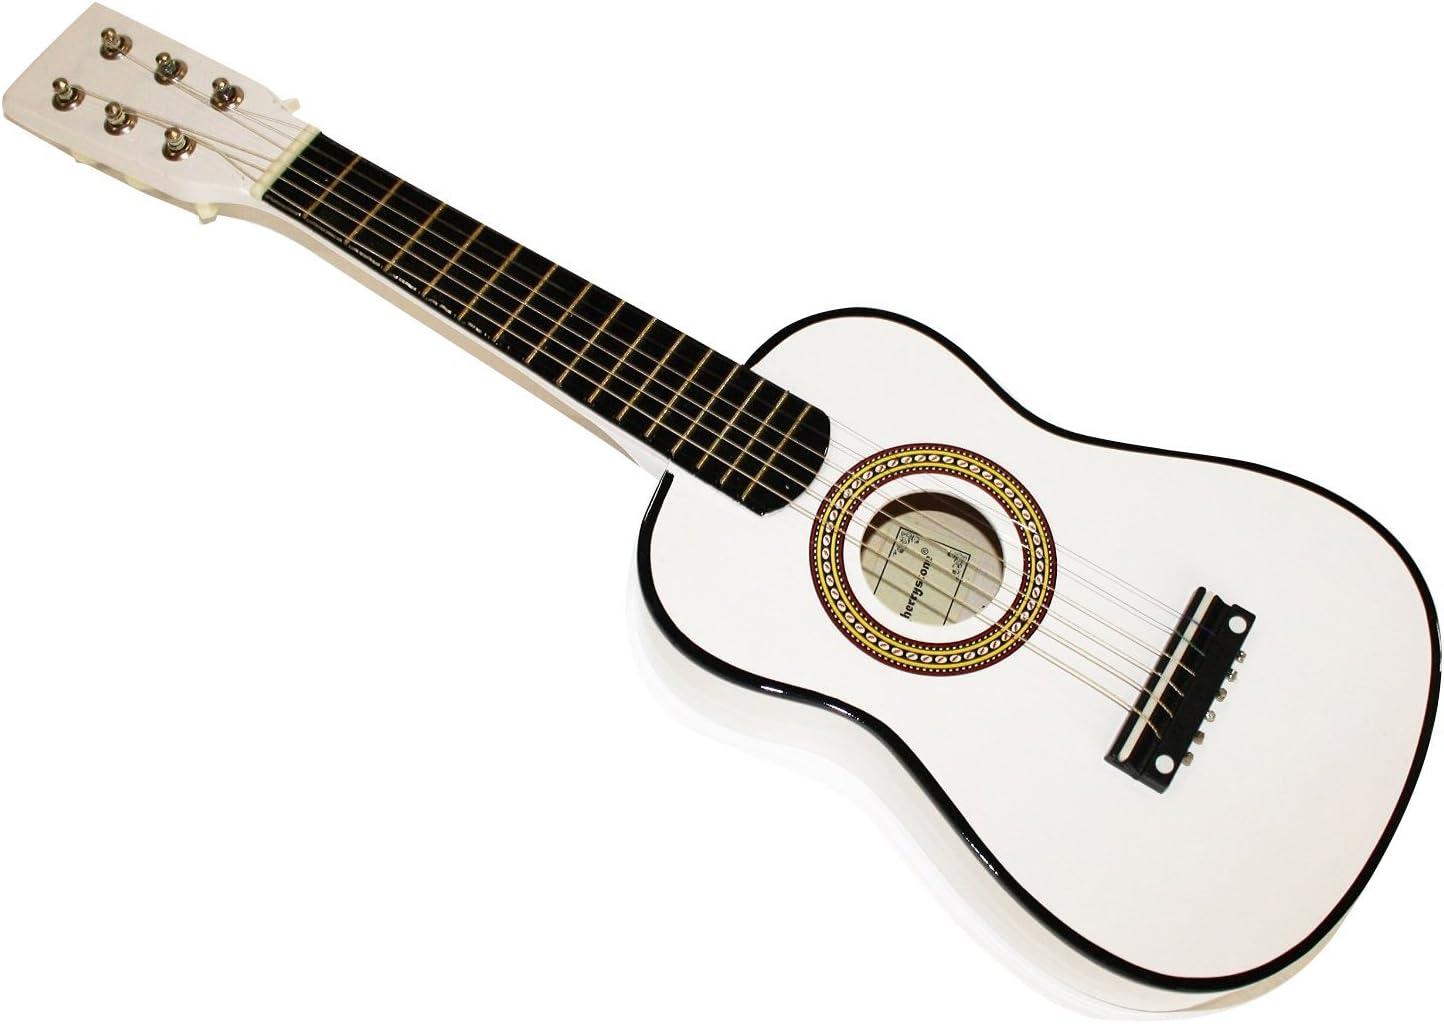 Cher rystone 0754235506607 1/16 6 cuerdas guitarra madera juguete ...